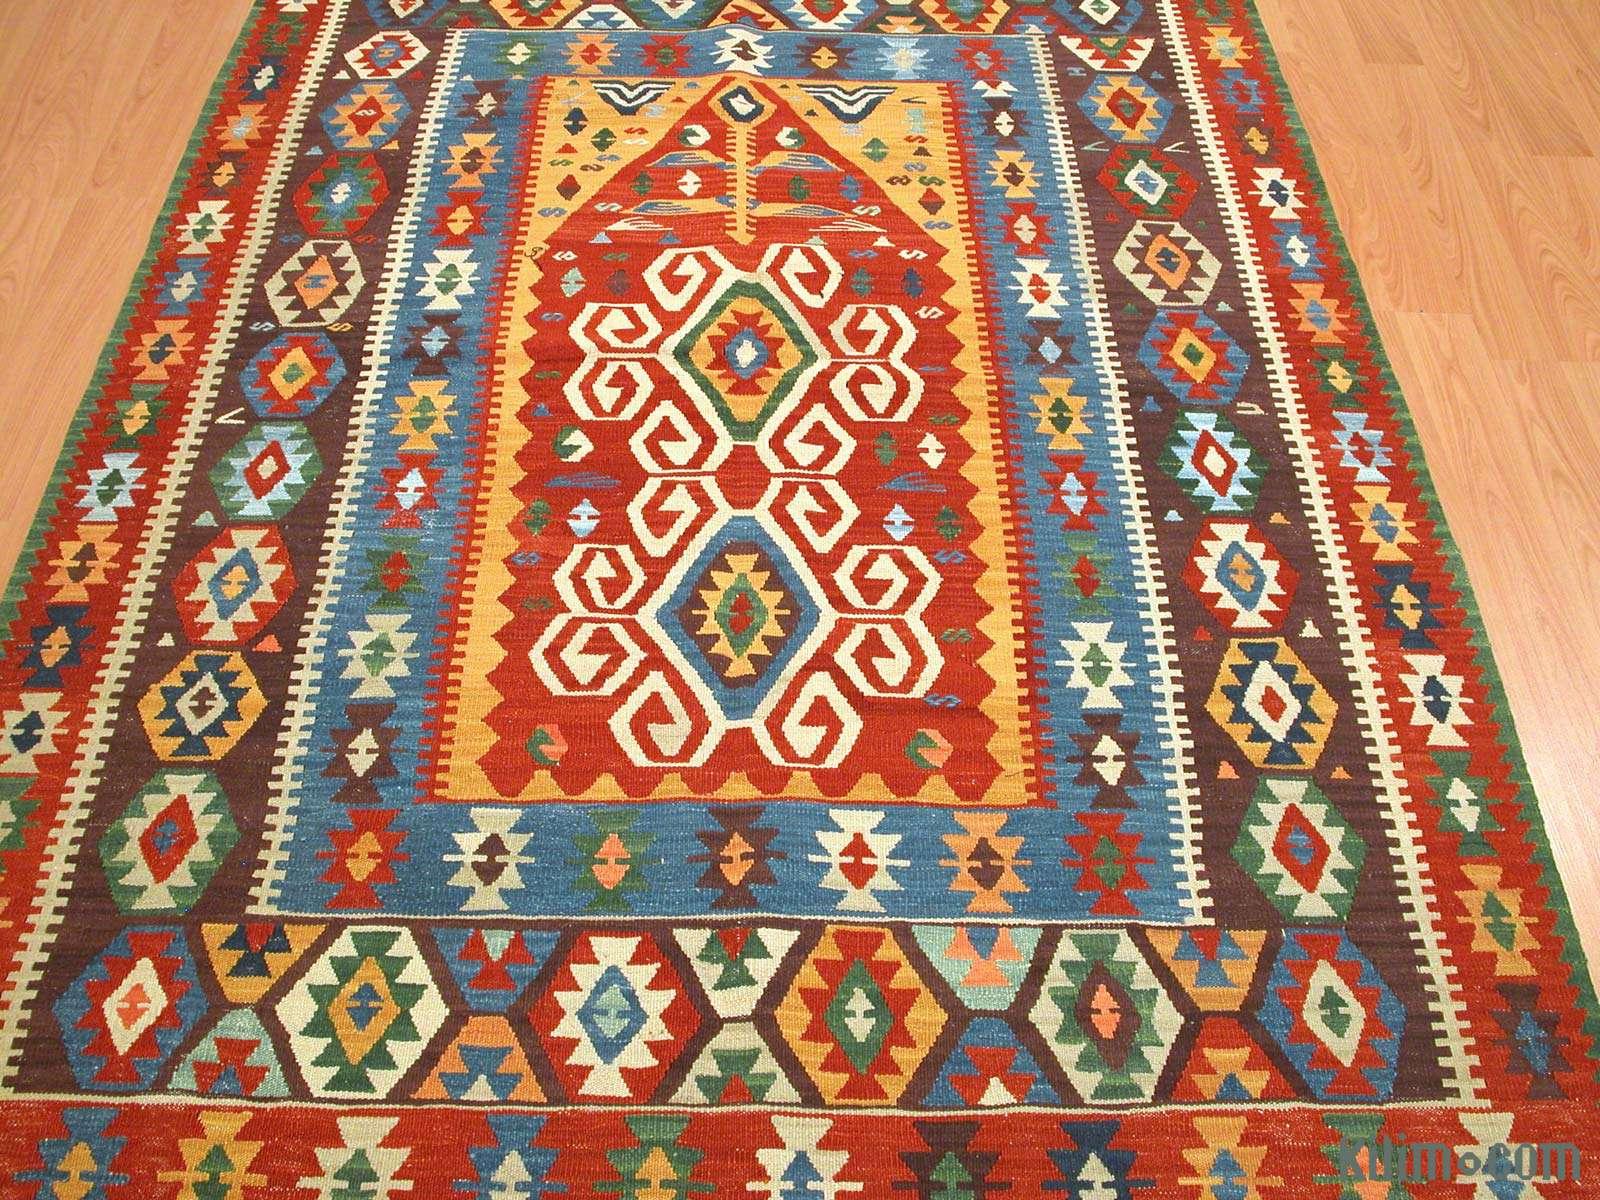 K0003868 Multicolor New Handwoven Turkish Kilim Rug